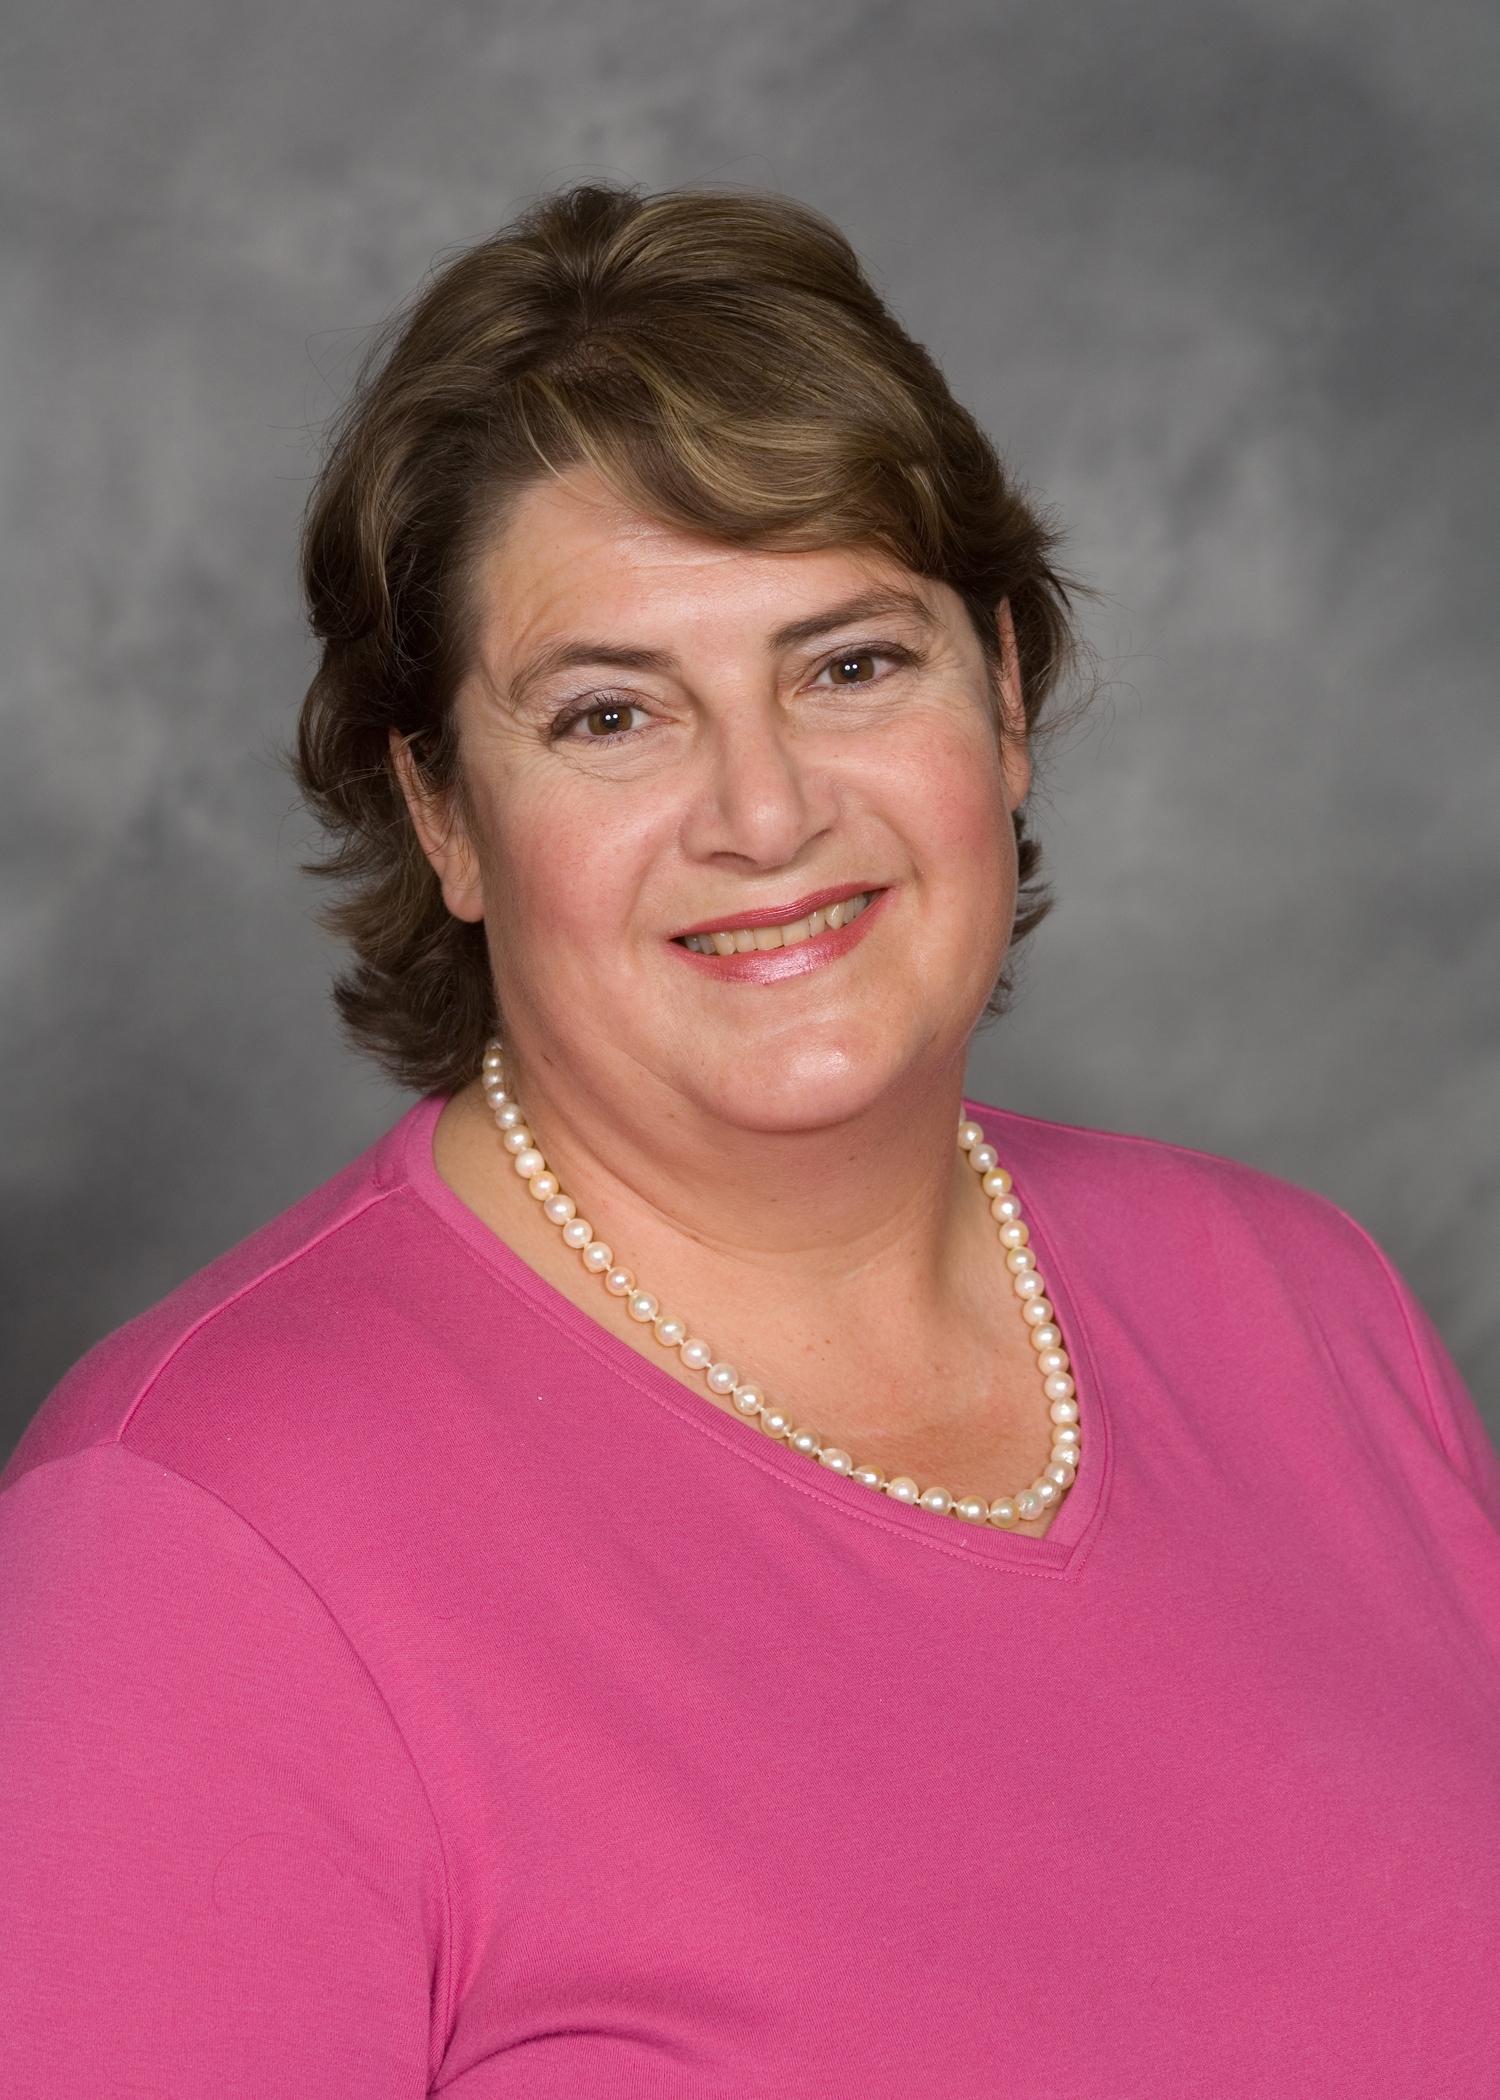 Kathy Stansbury